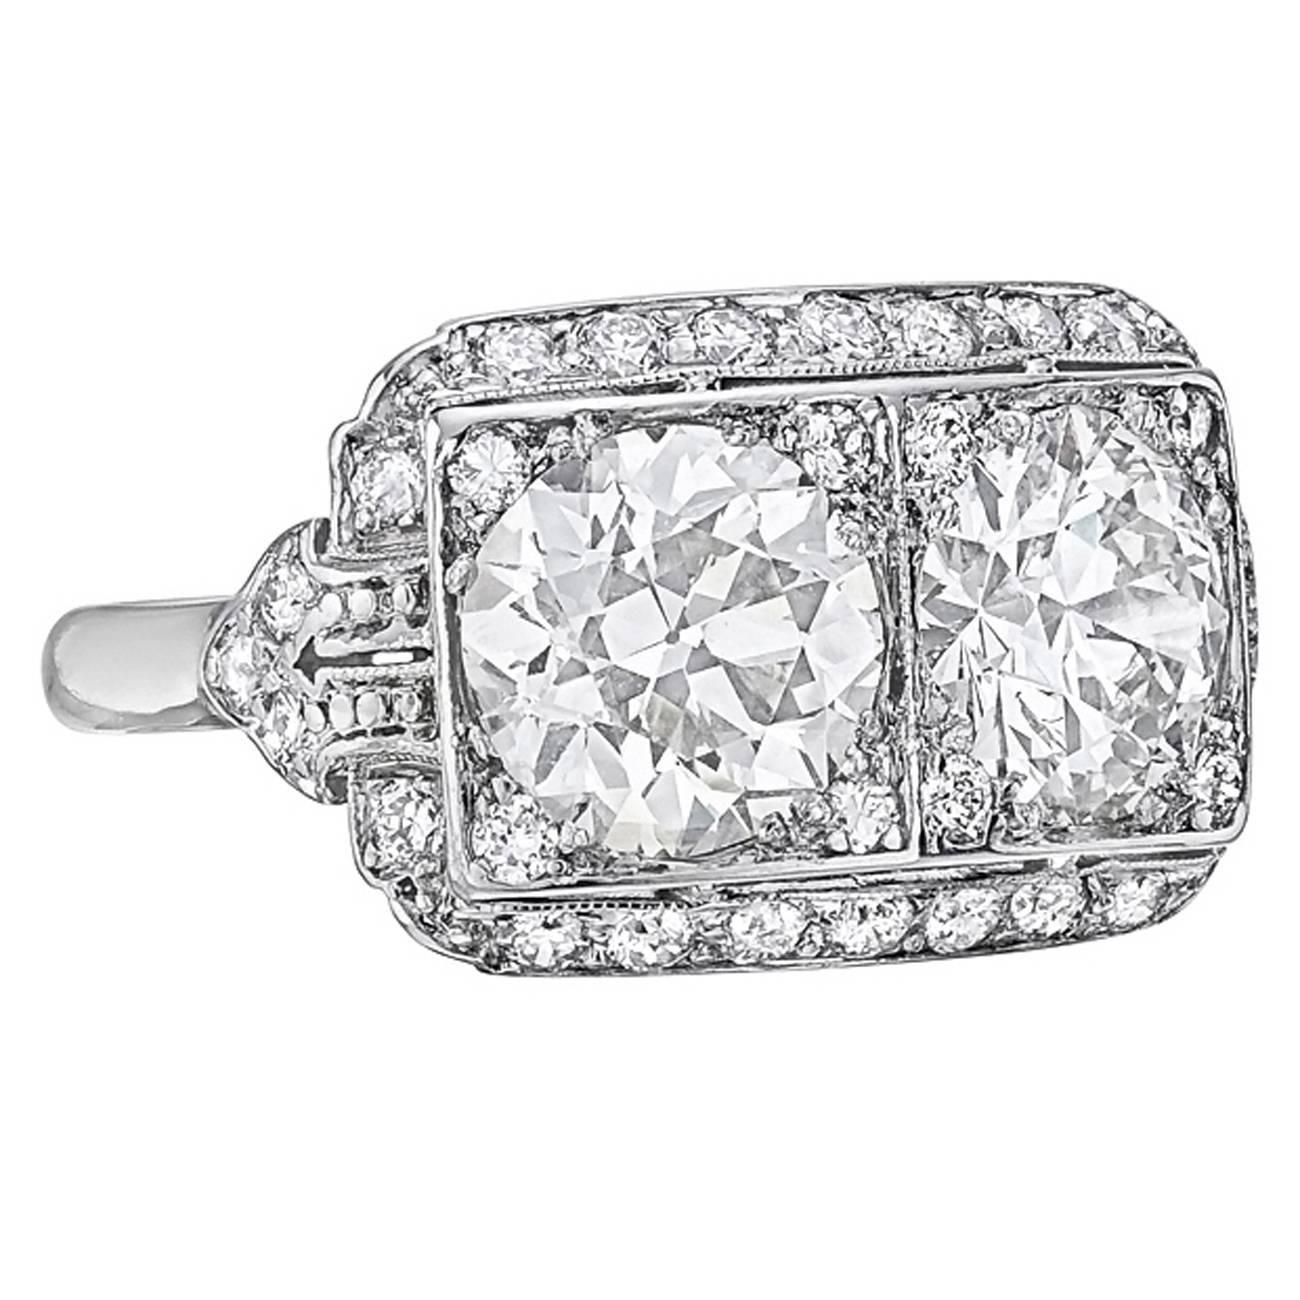 Art Deco Twin Diamond Dress Ring Diamond Dress Ring Antique Engagement Rings Vintage Inspired Rings